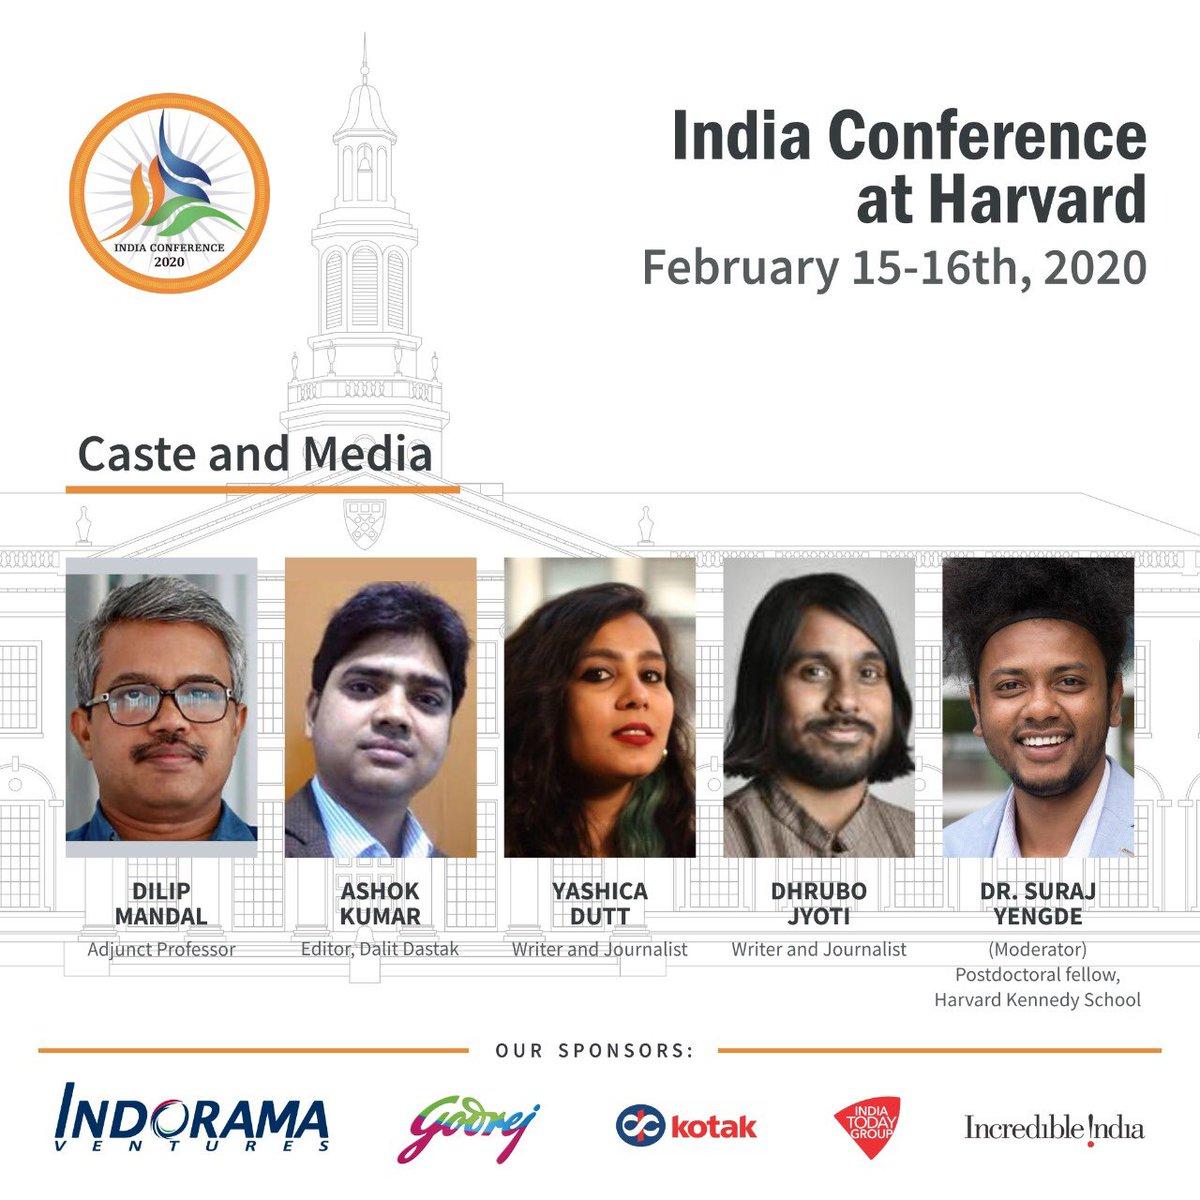 We will commemorate centenary of Ambedkar's journalism and celebrate Dalit journalism in general with @Profdilipmandal @DalitDastak @YashicaDutt @dhrubojyoti#Mooknayak100 @indiaconf2020